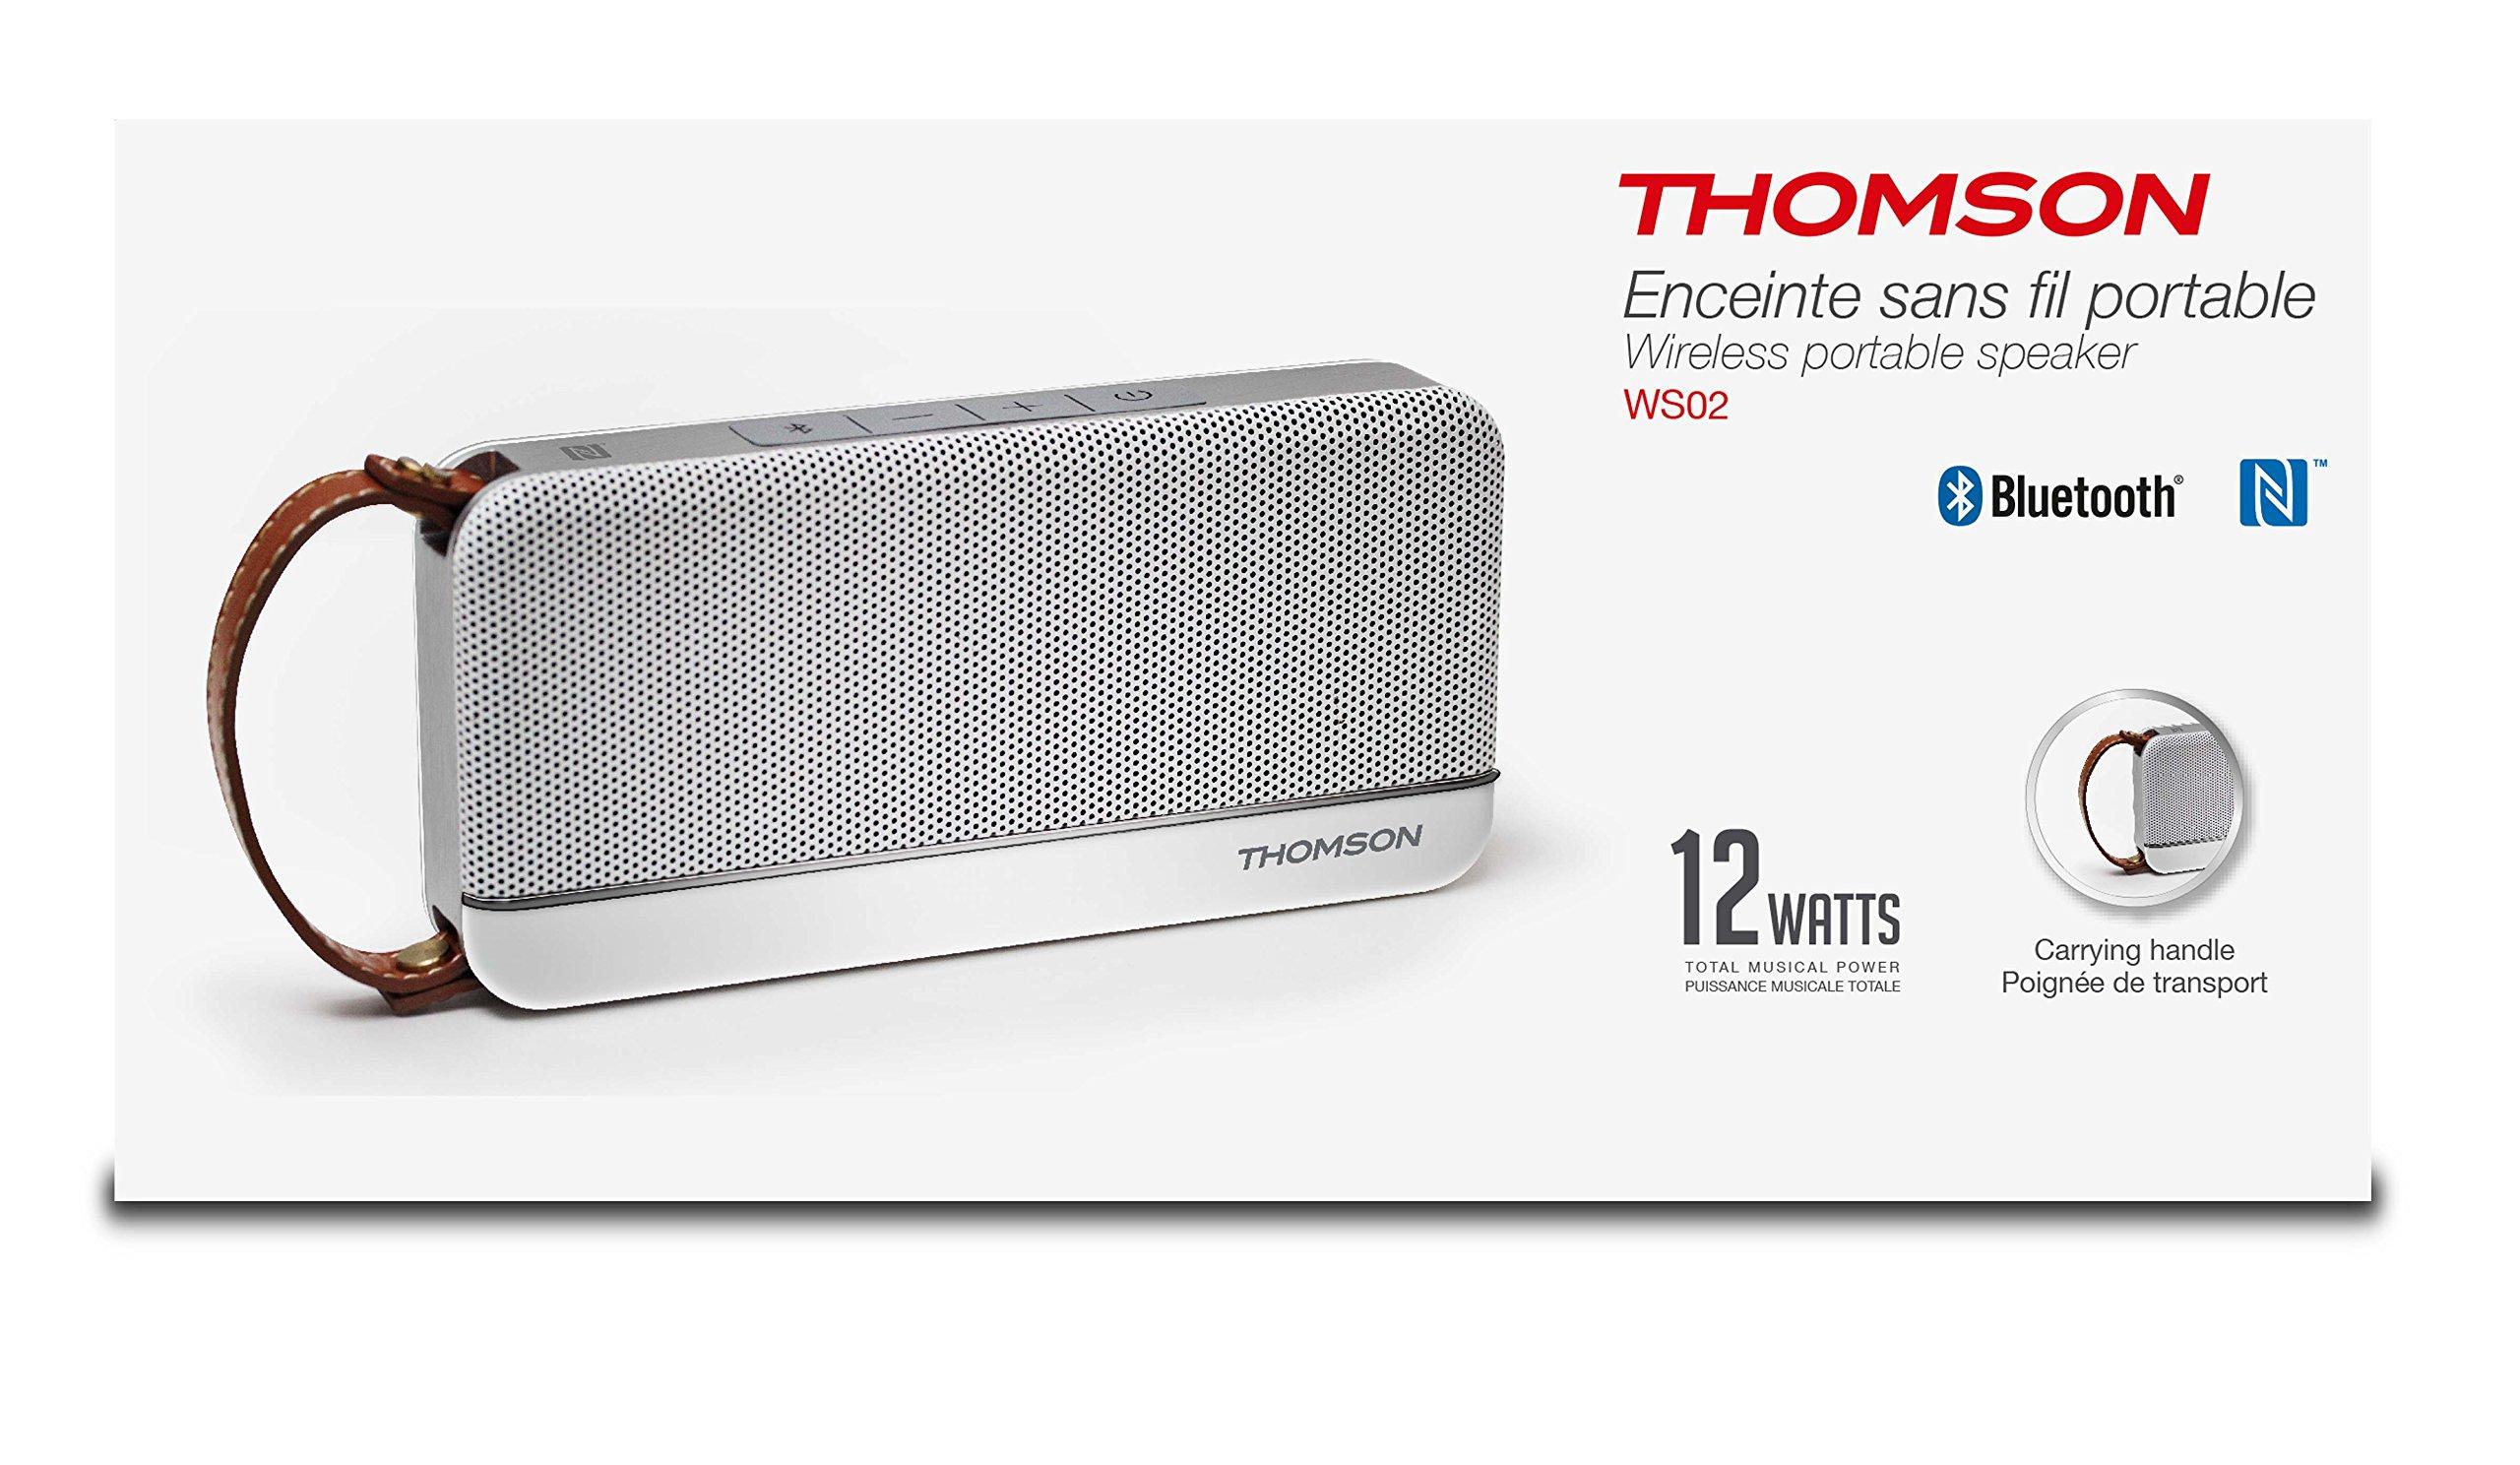 Amazon.es: Bigben Sound: THOMSON